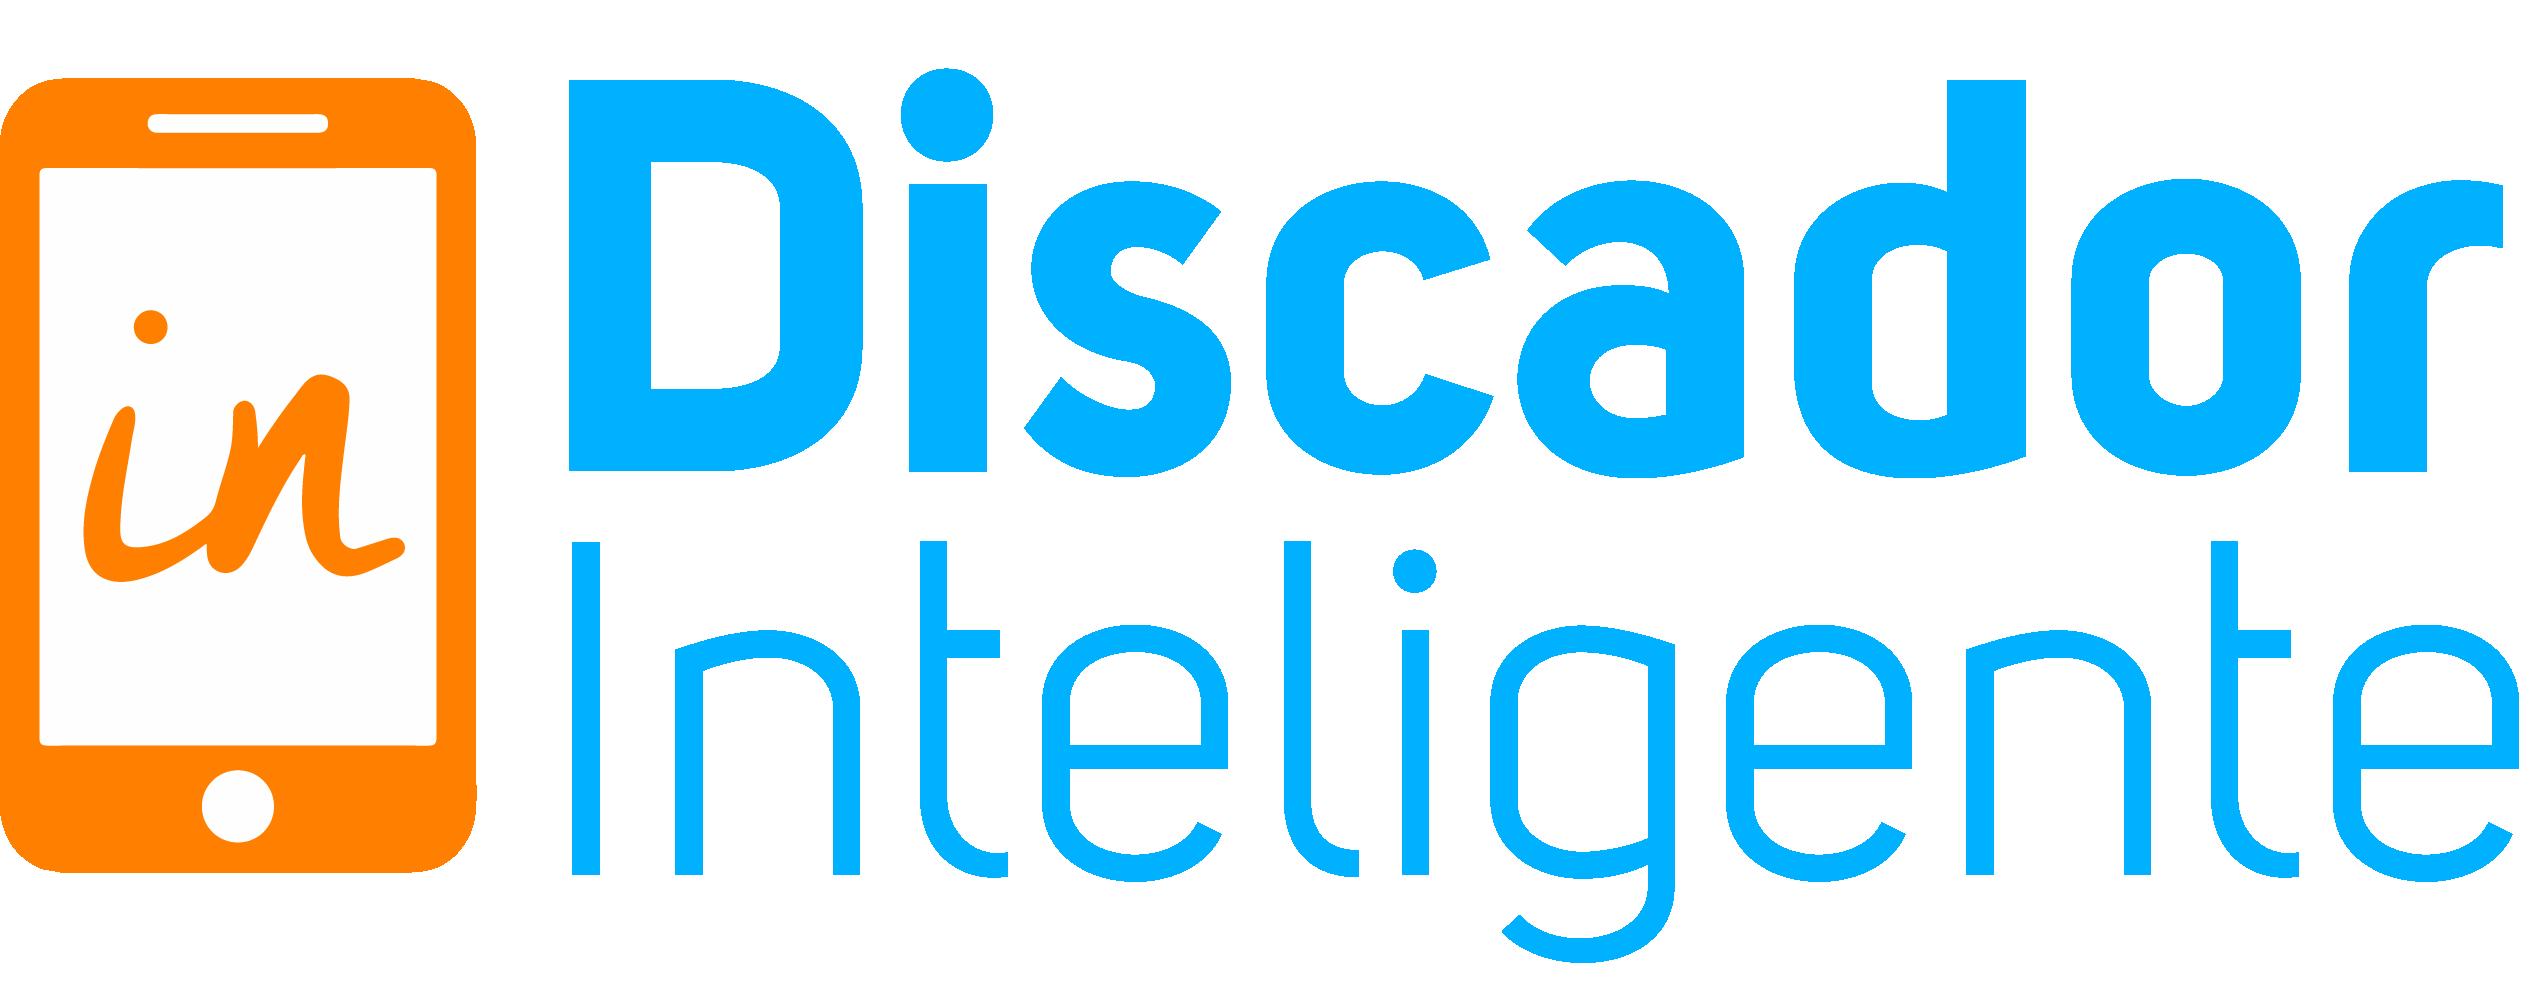 Discador Inteligente